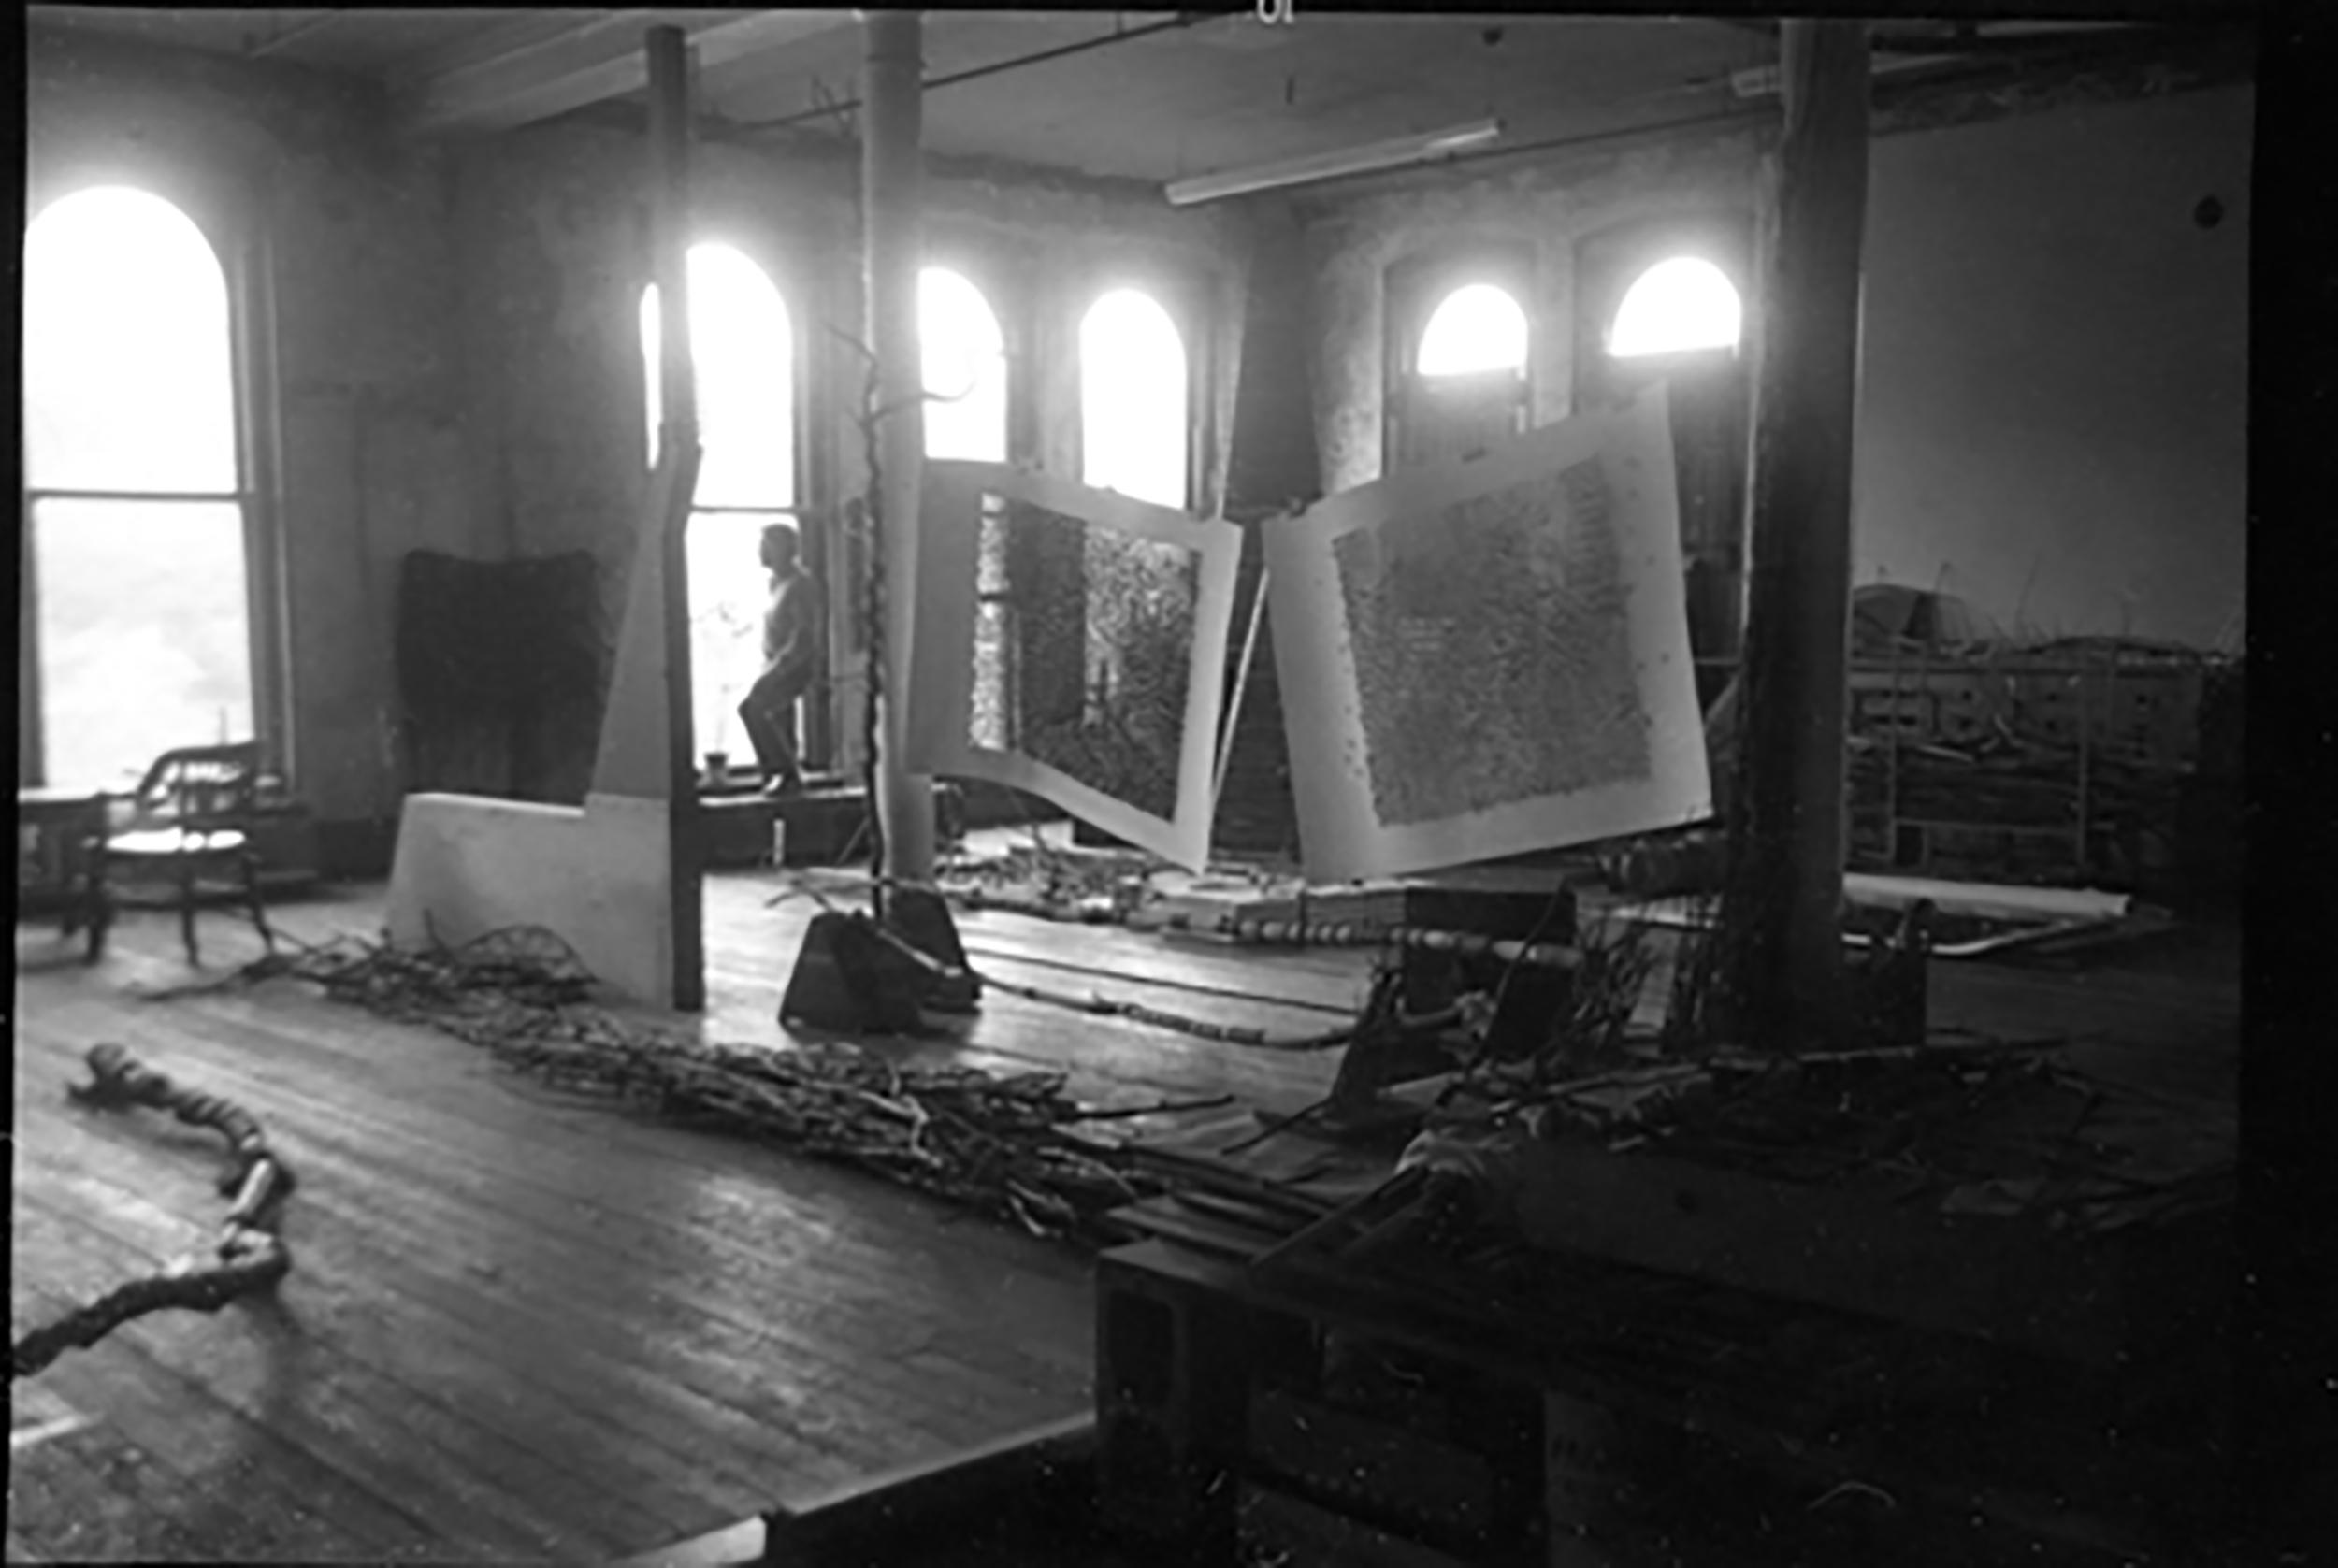 JU in his studio loft, 4th floor, Fain Carpet building, 128 North Main St, Providence, RI